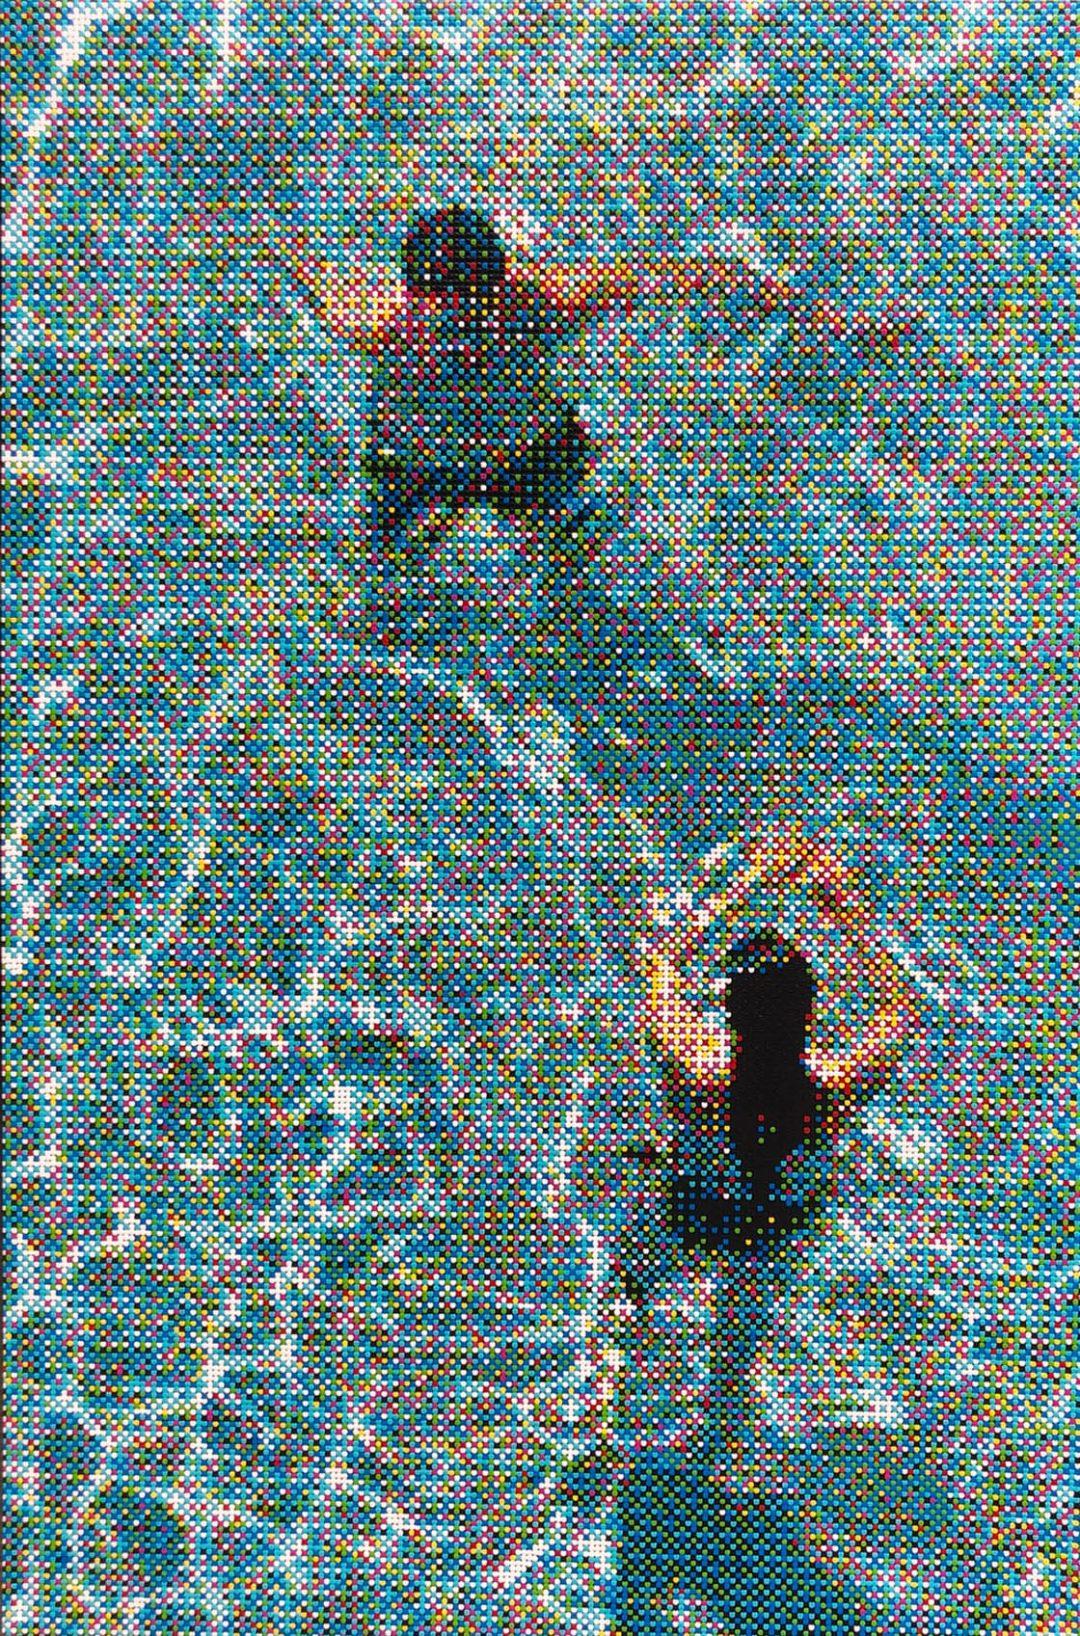 "Swimmers XXXII, 72"" x 48"" - William Betts"